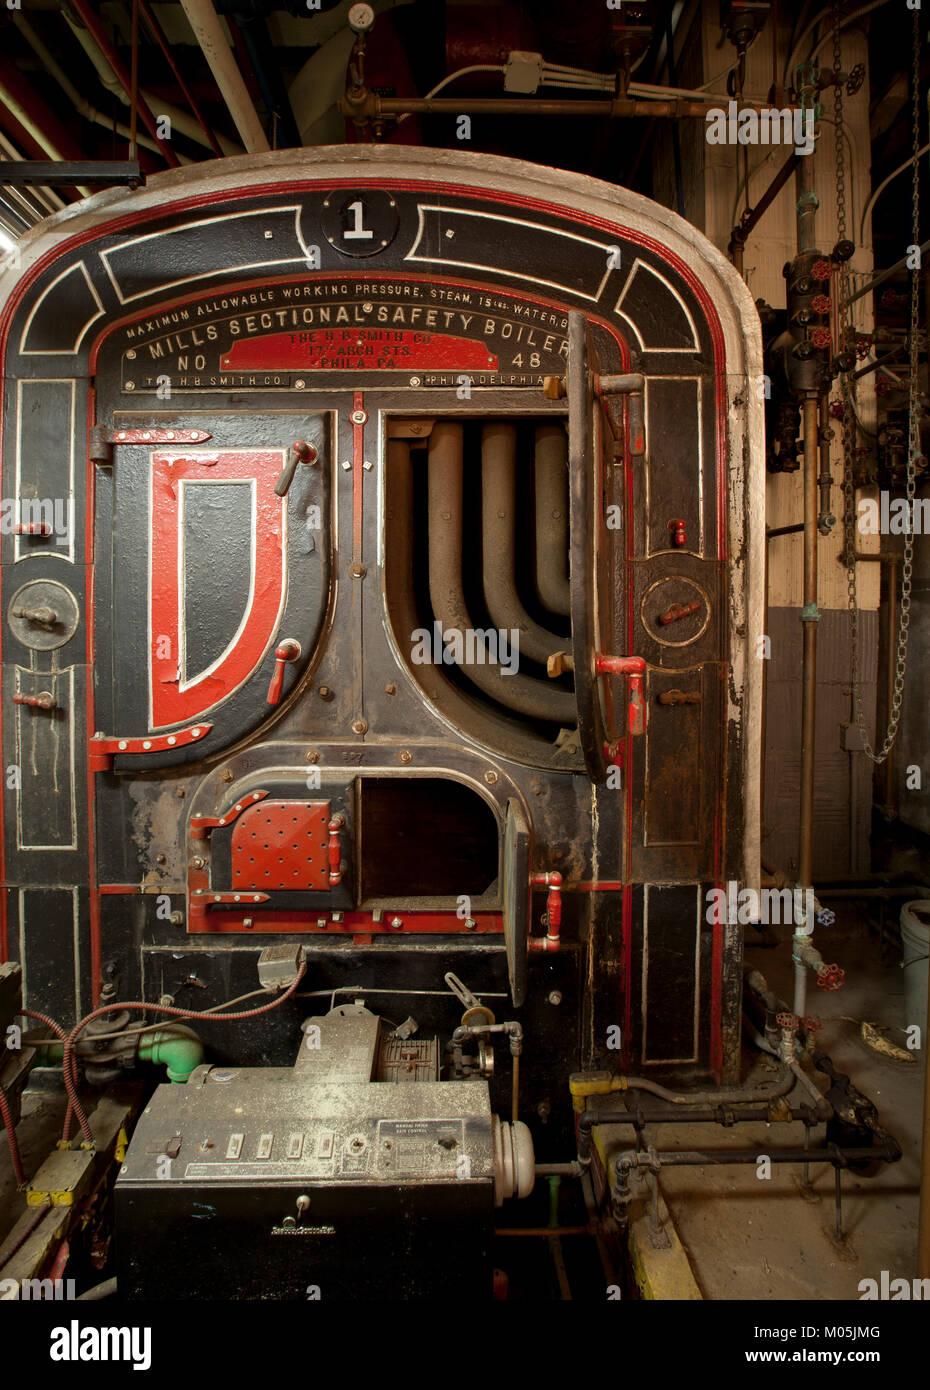 Dampf Kessel Stockfoto, Bild: 172228128 - Alamy